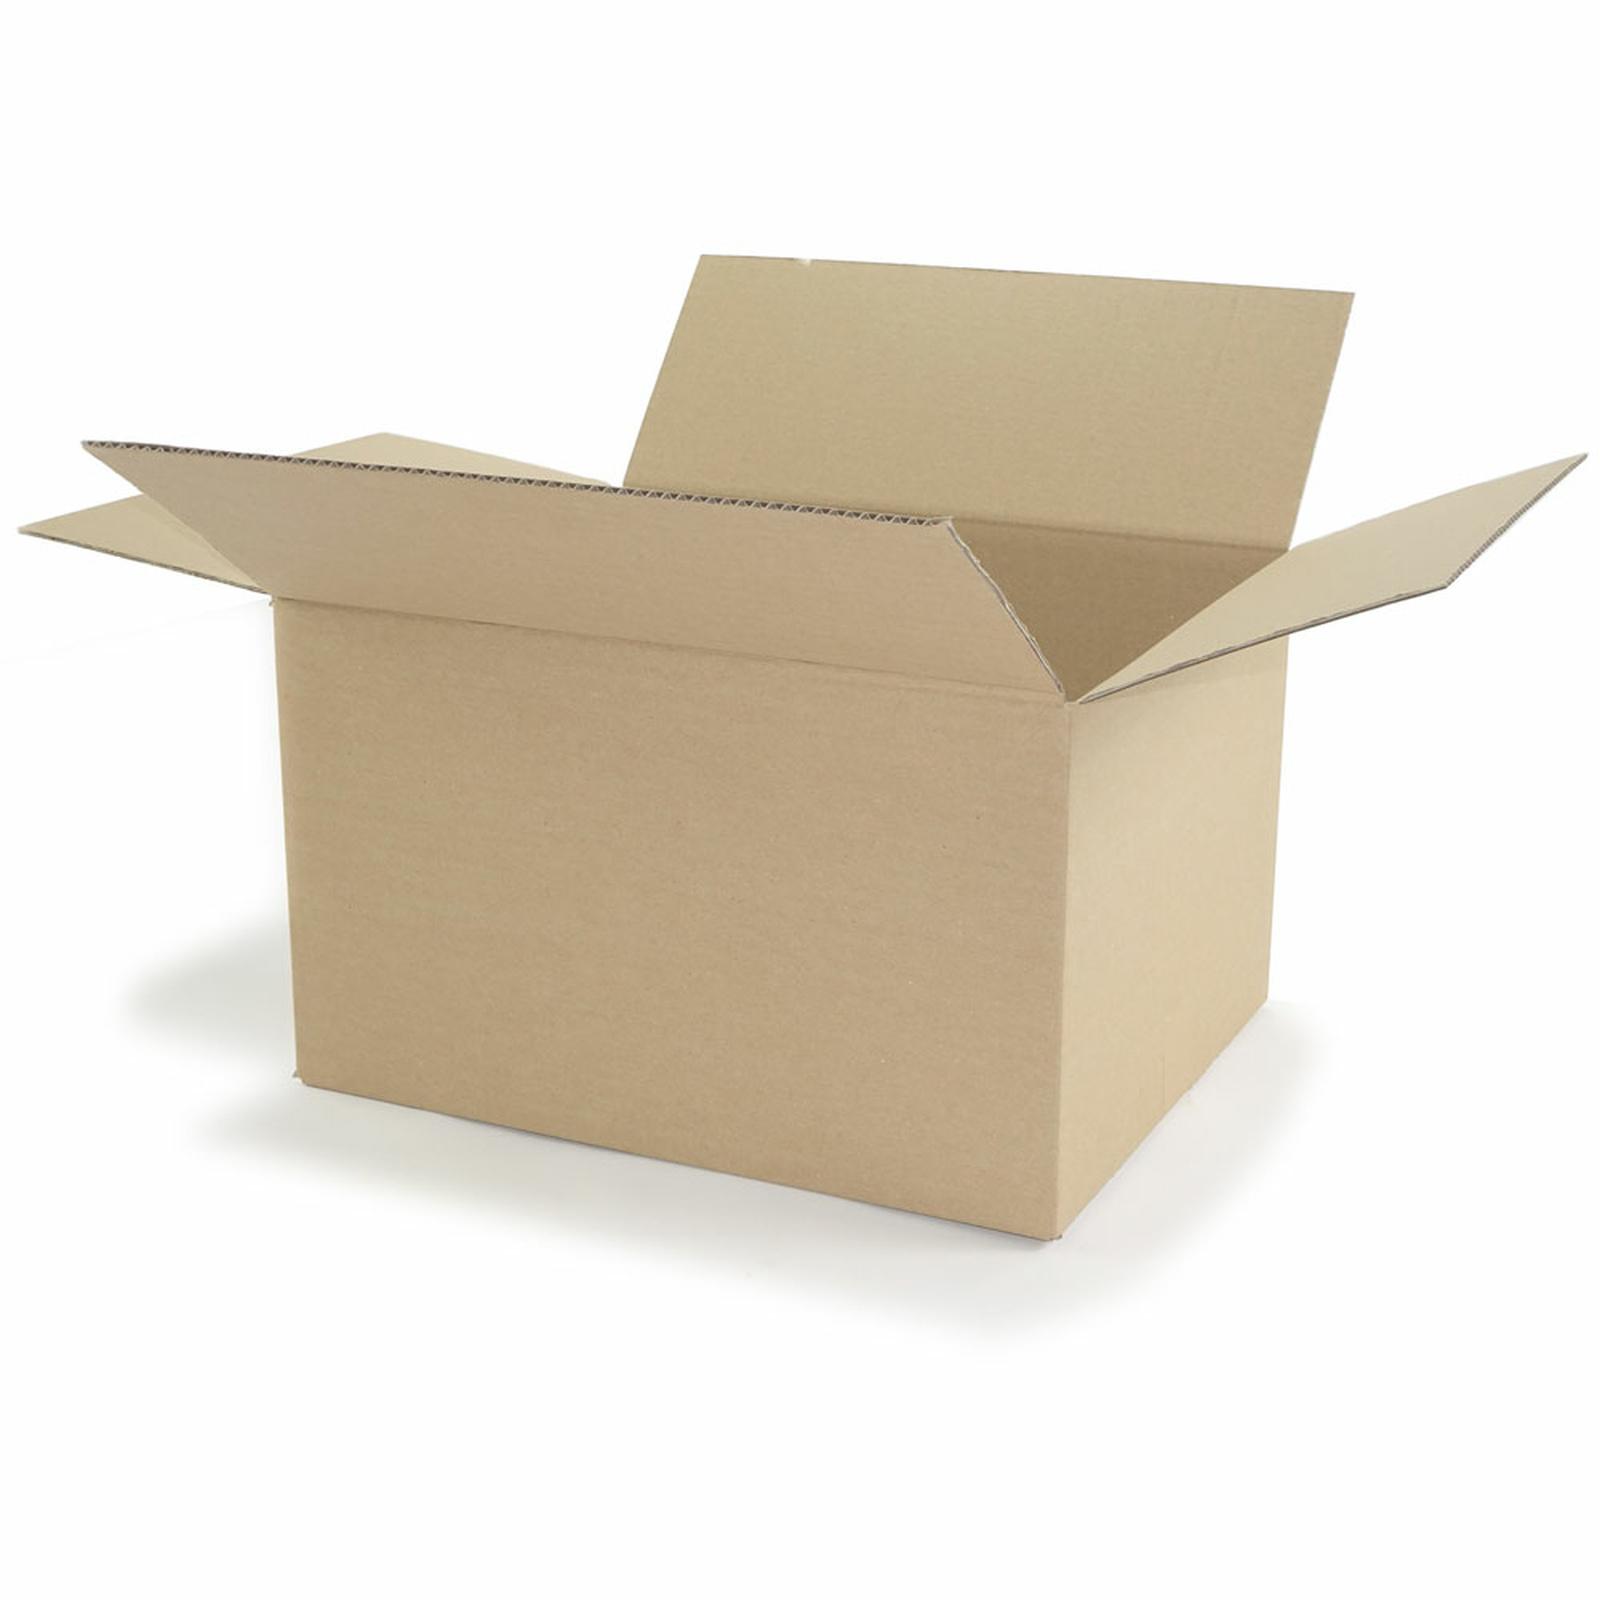 einwellige kartons 500x400x300 mm g nstig kaufen 0 86. Black Bedroom Furniture Sets. Home Design Ideas